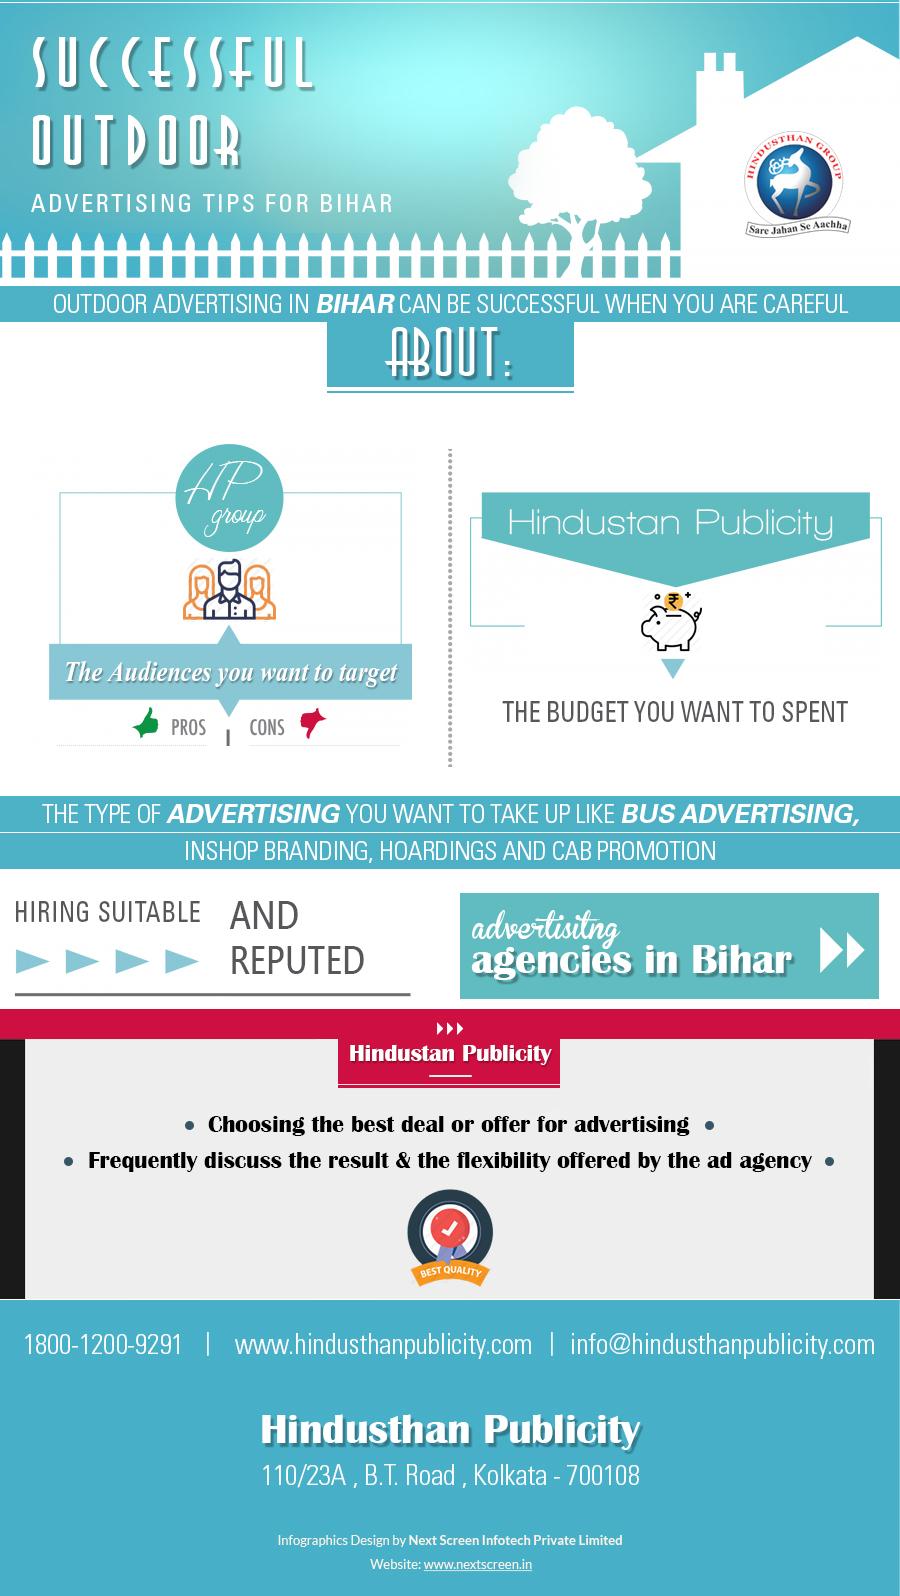 Successful Outdoor Advertising Tips for Bihar